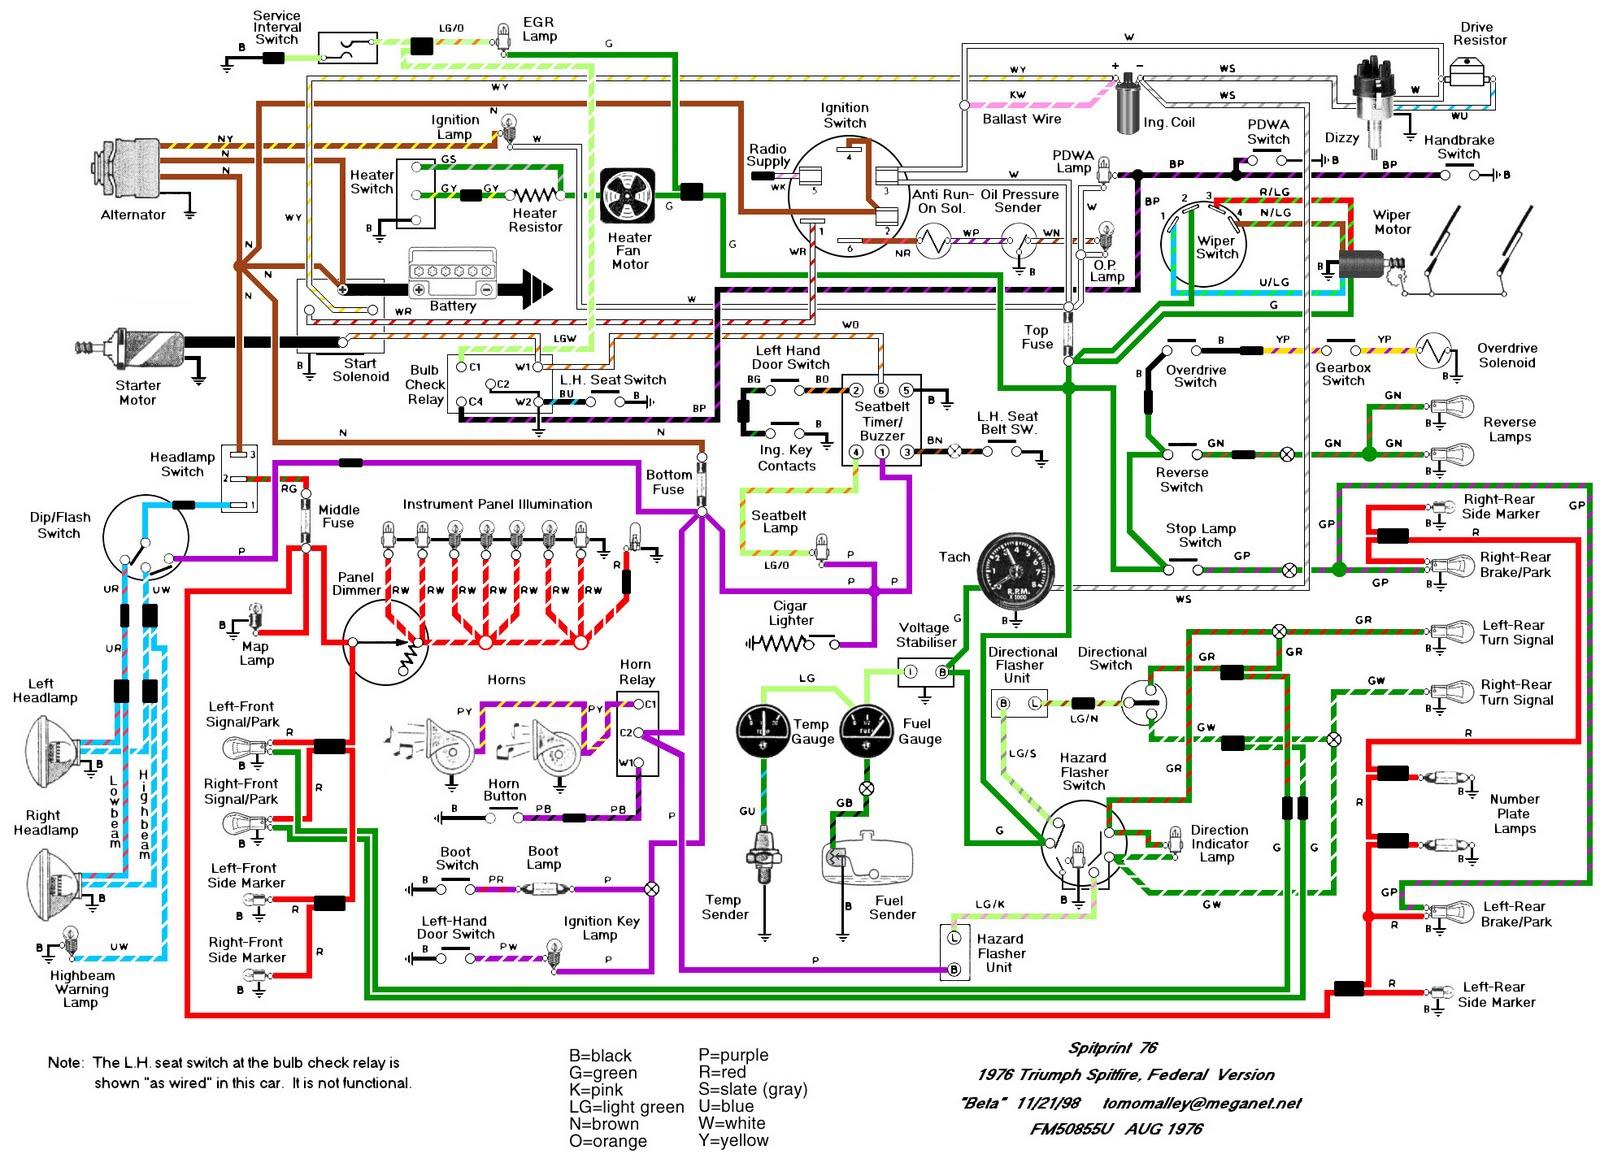 1976 triumph spitfire wiring diagram